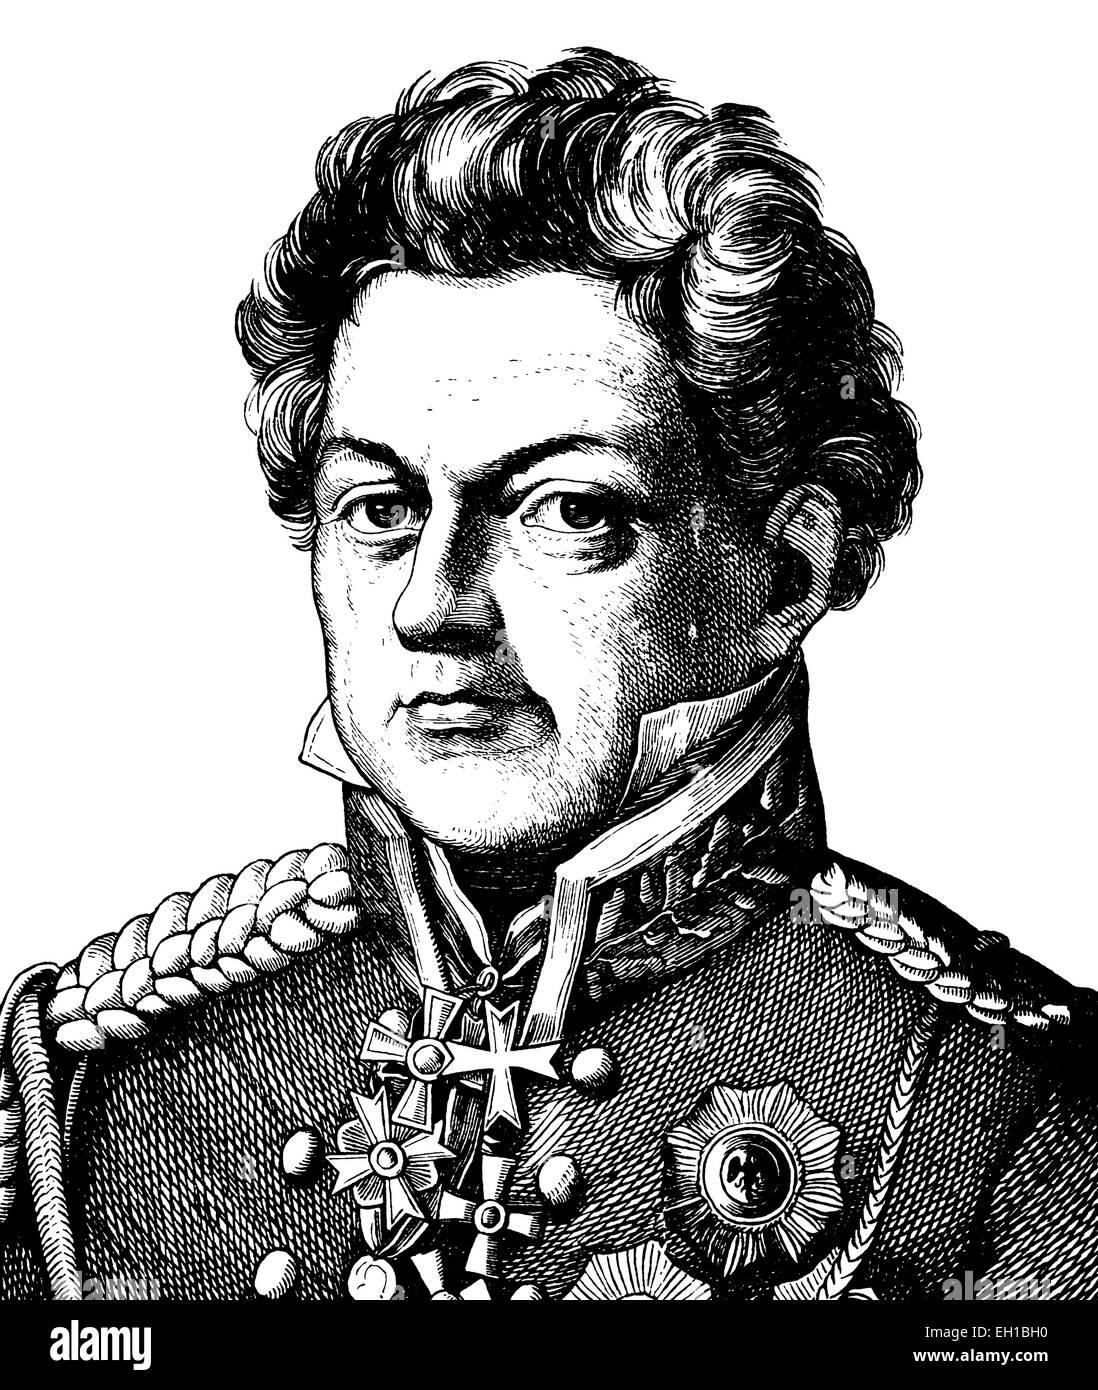 Digital improved image of August Neidhard, Graf von Gneisenau, 1760 - 1831, Prussian Field Marshall, portrait, historical - Stock Image